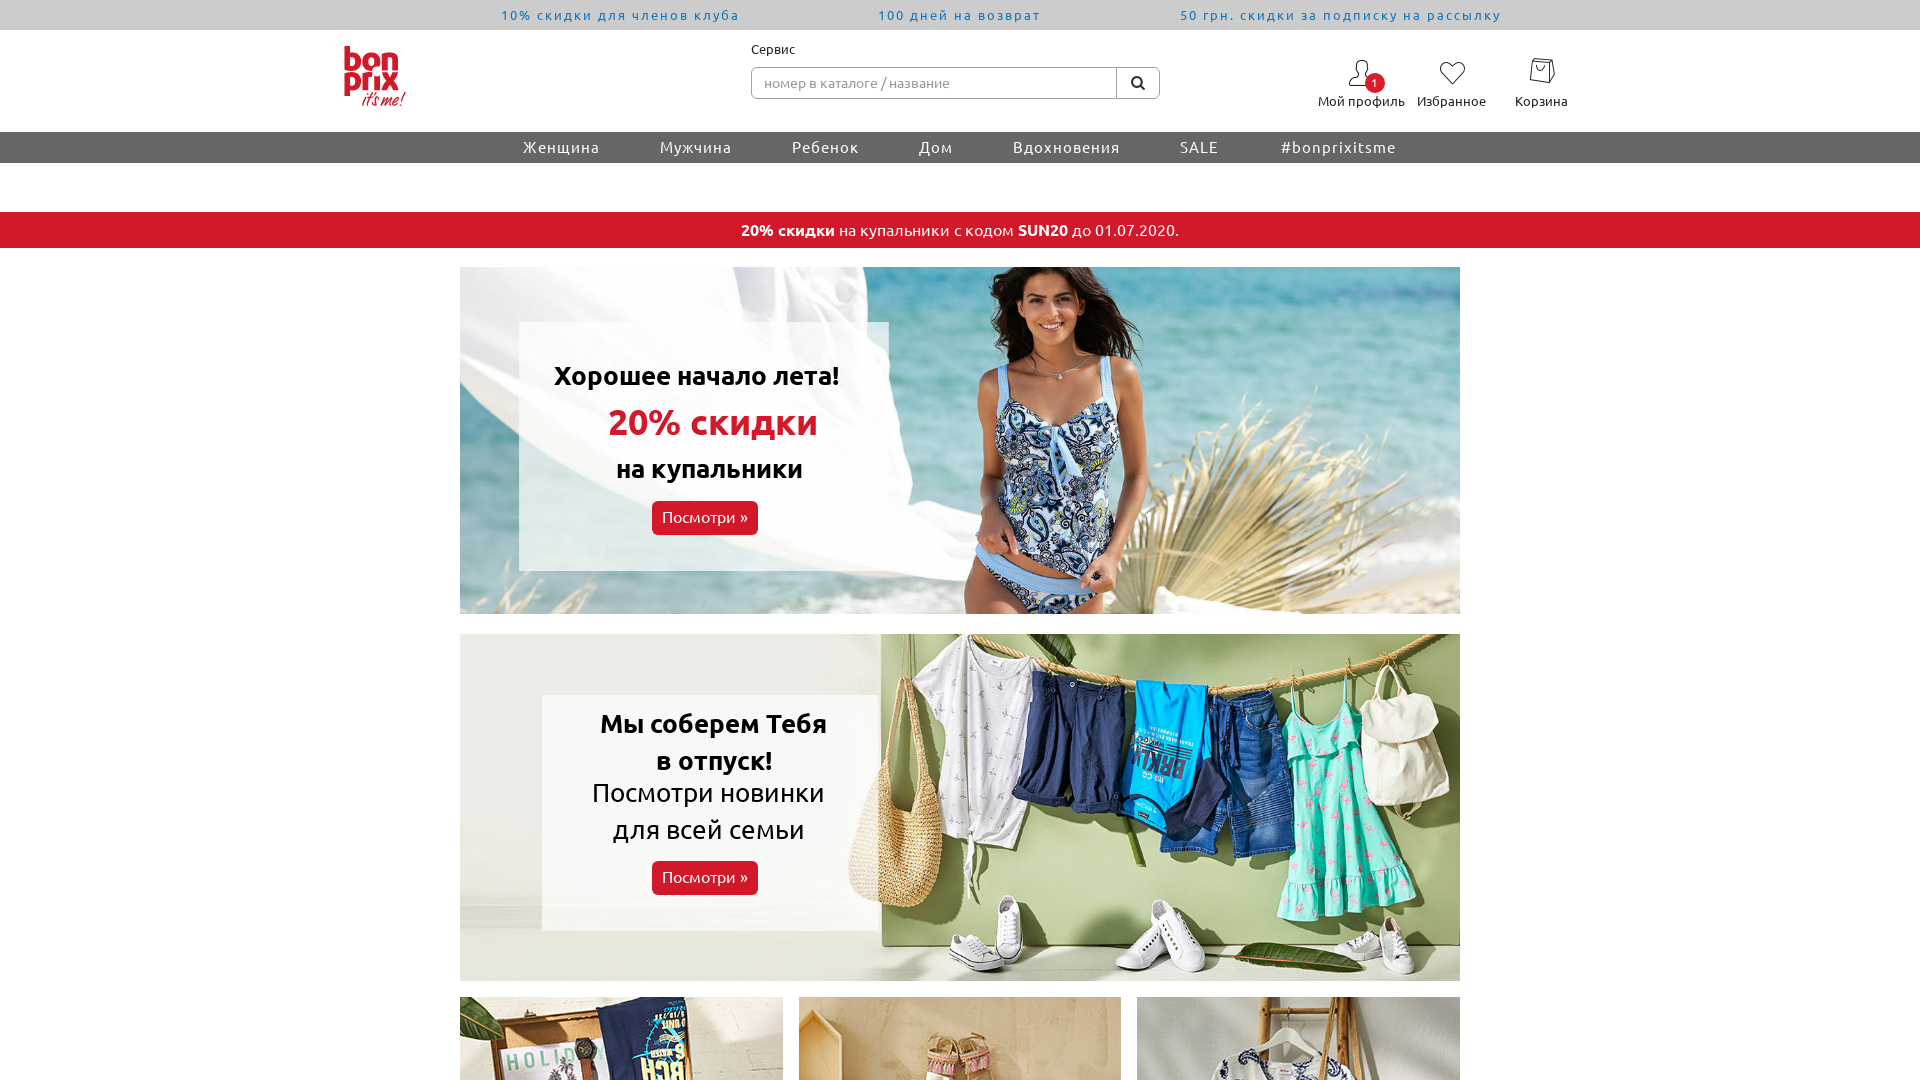 Bonprix Ukraine website